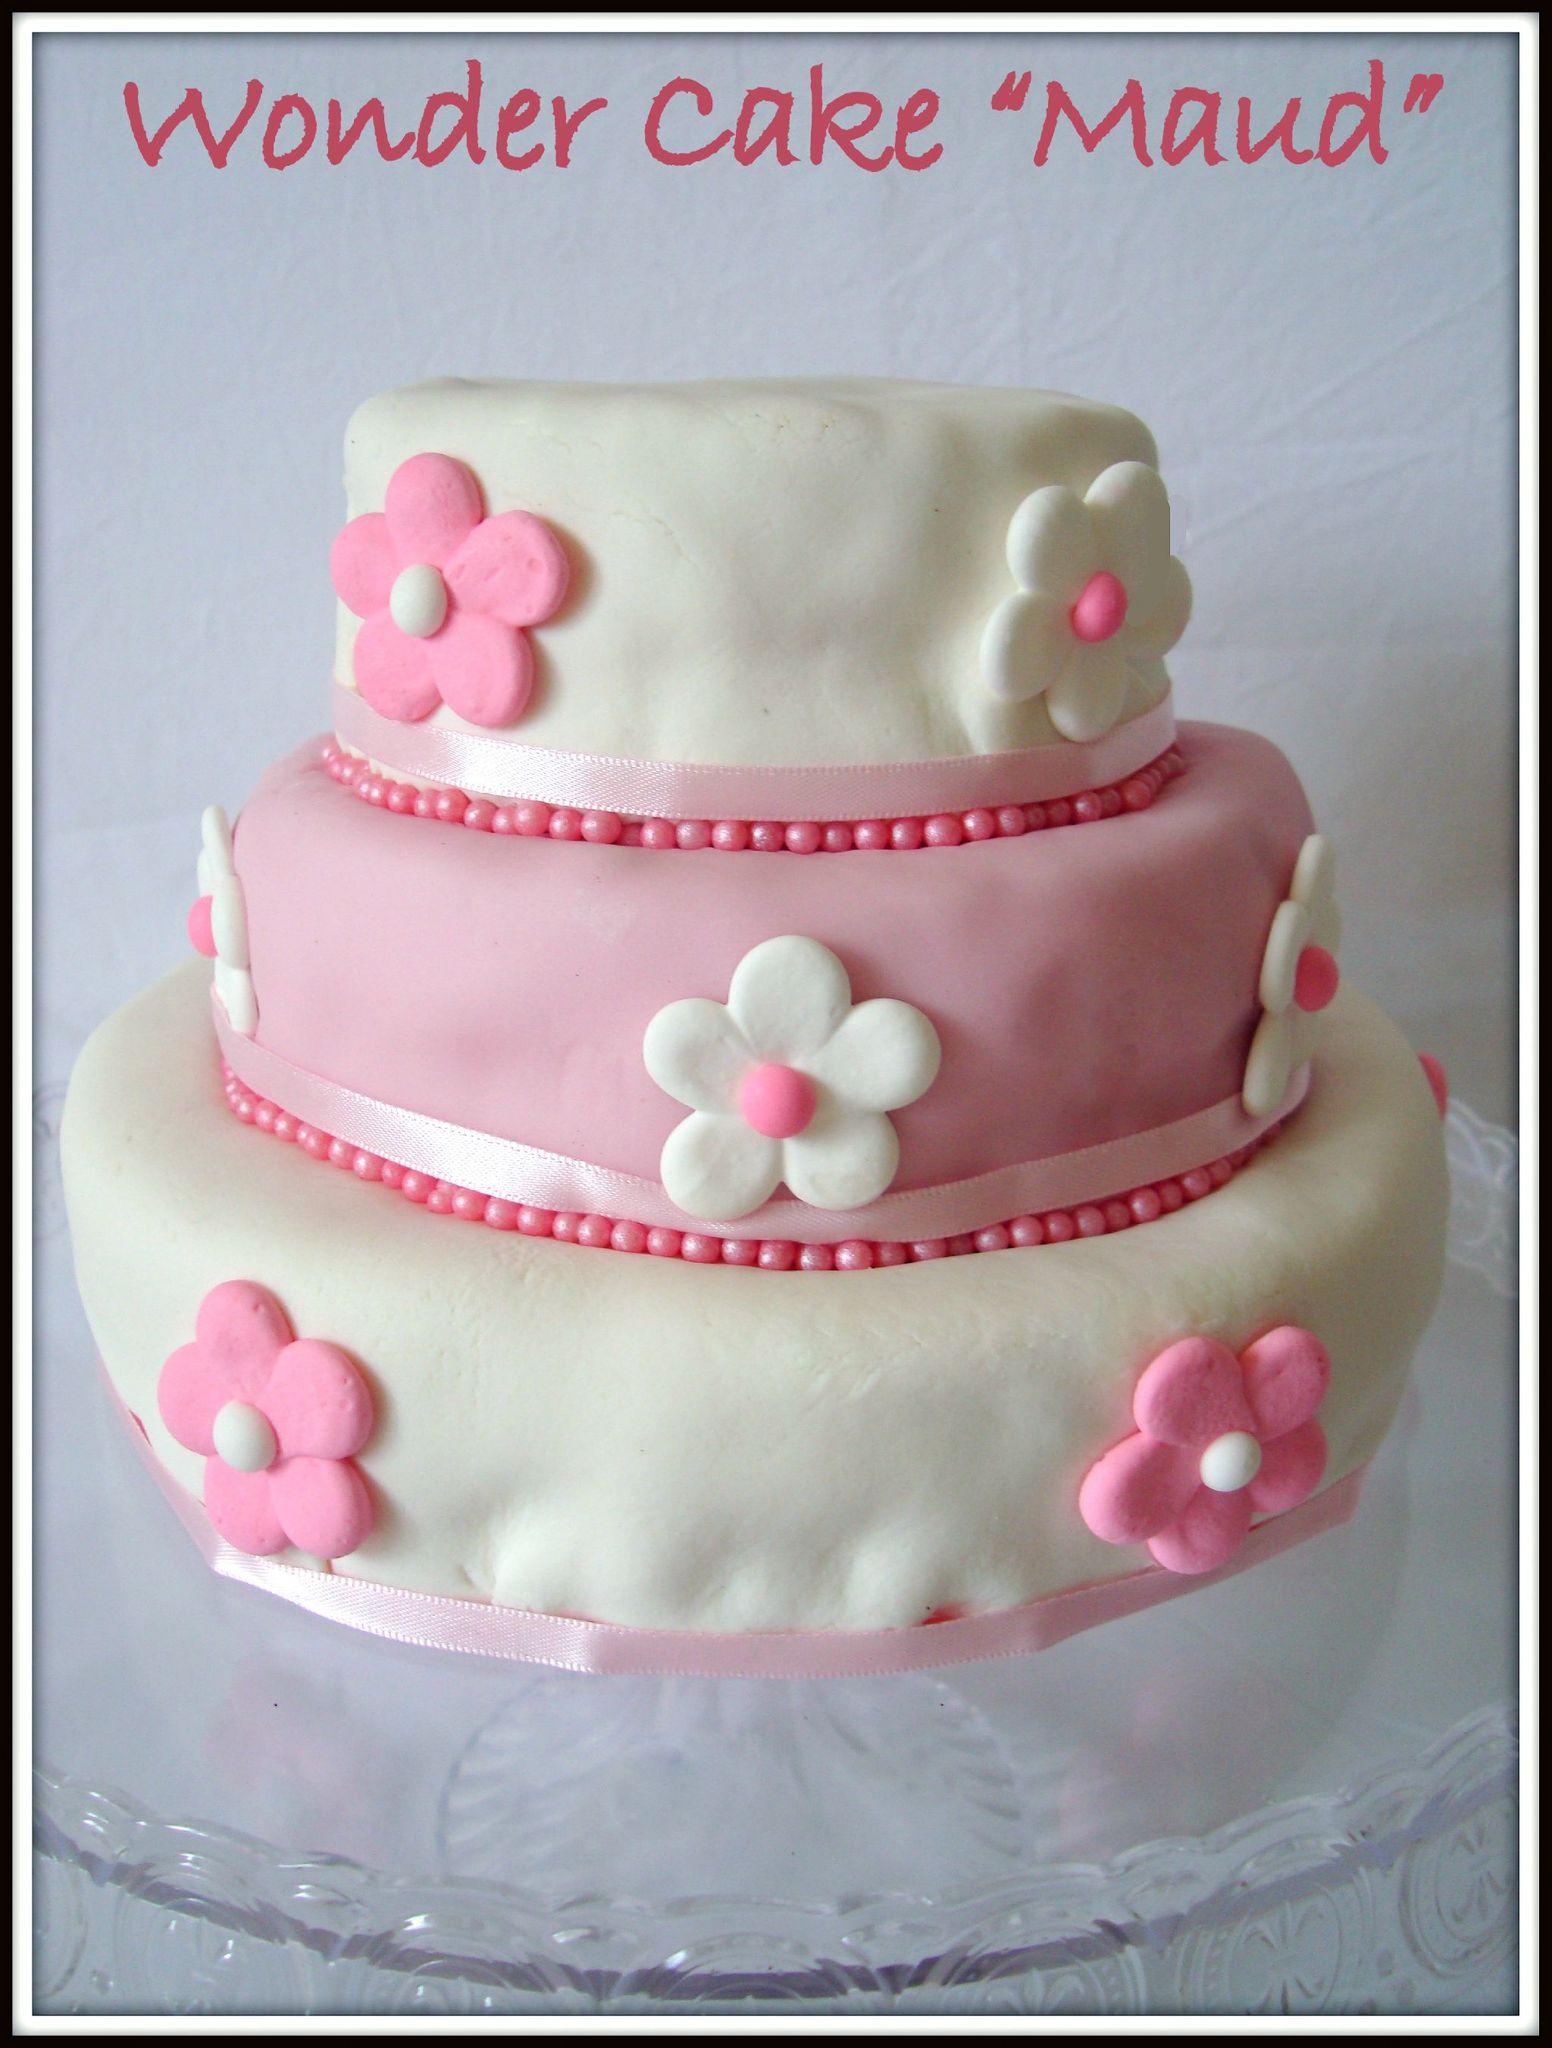 Wonder cake Maud